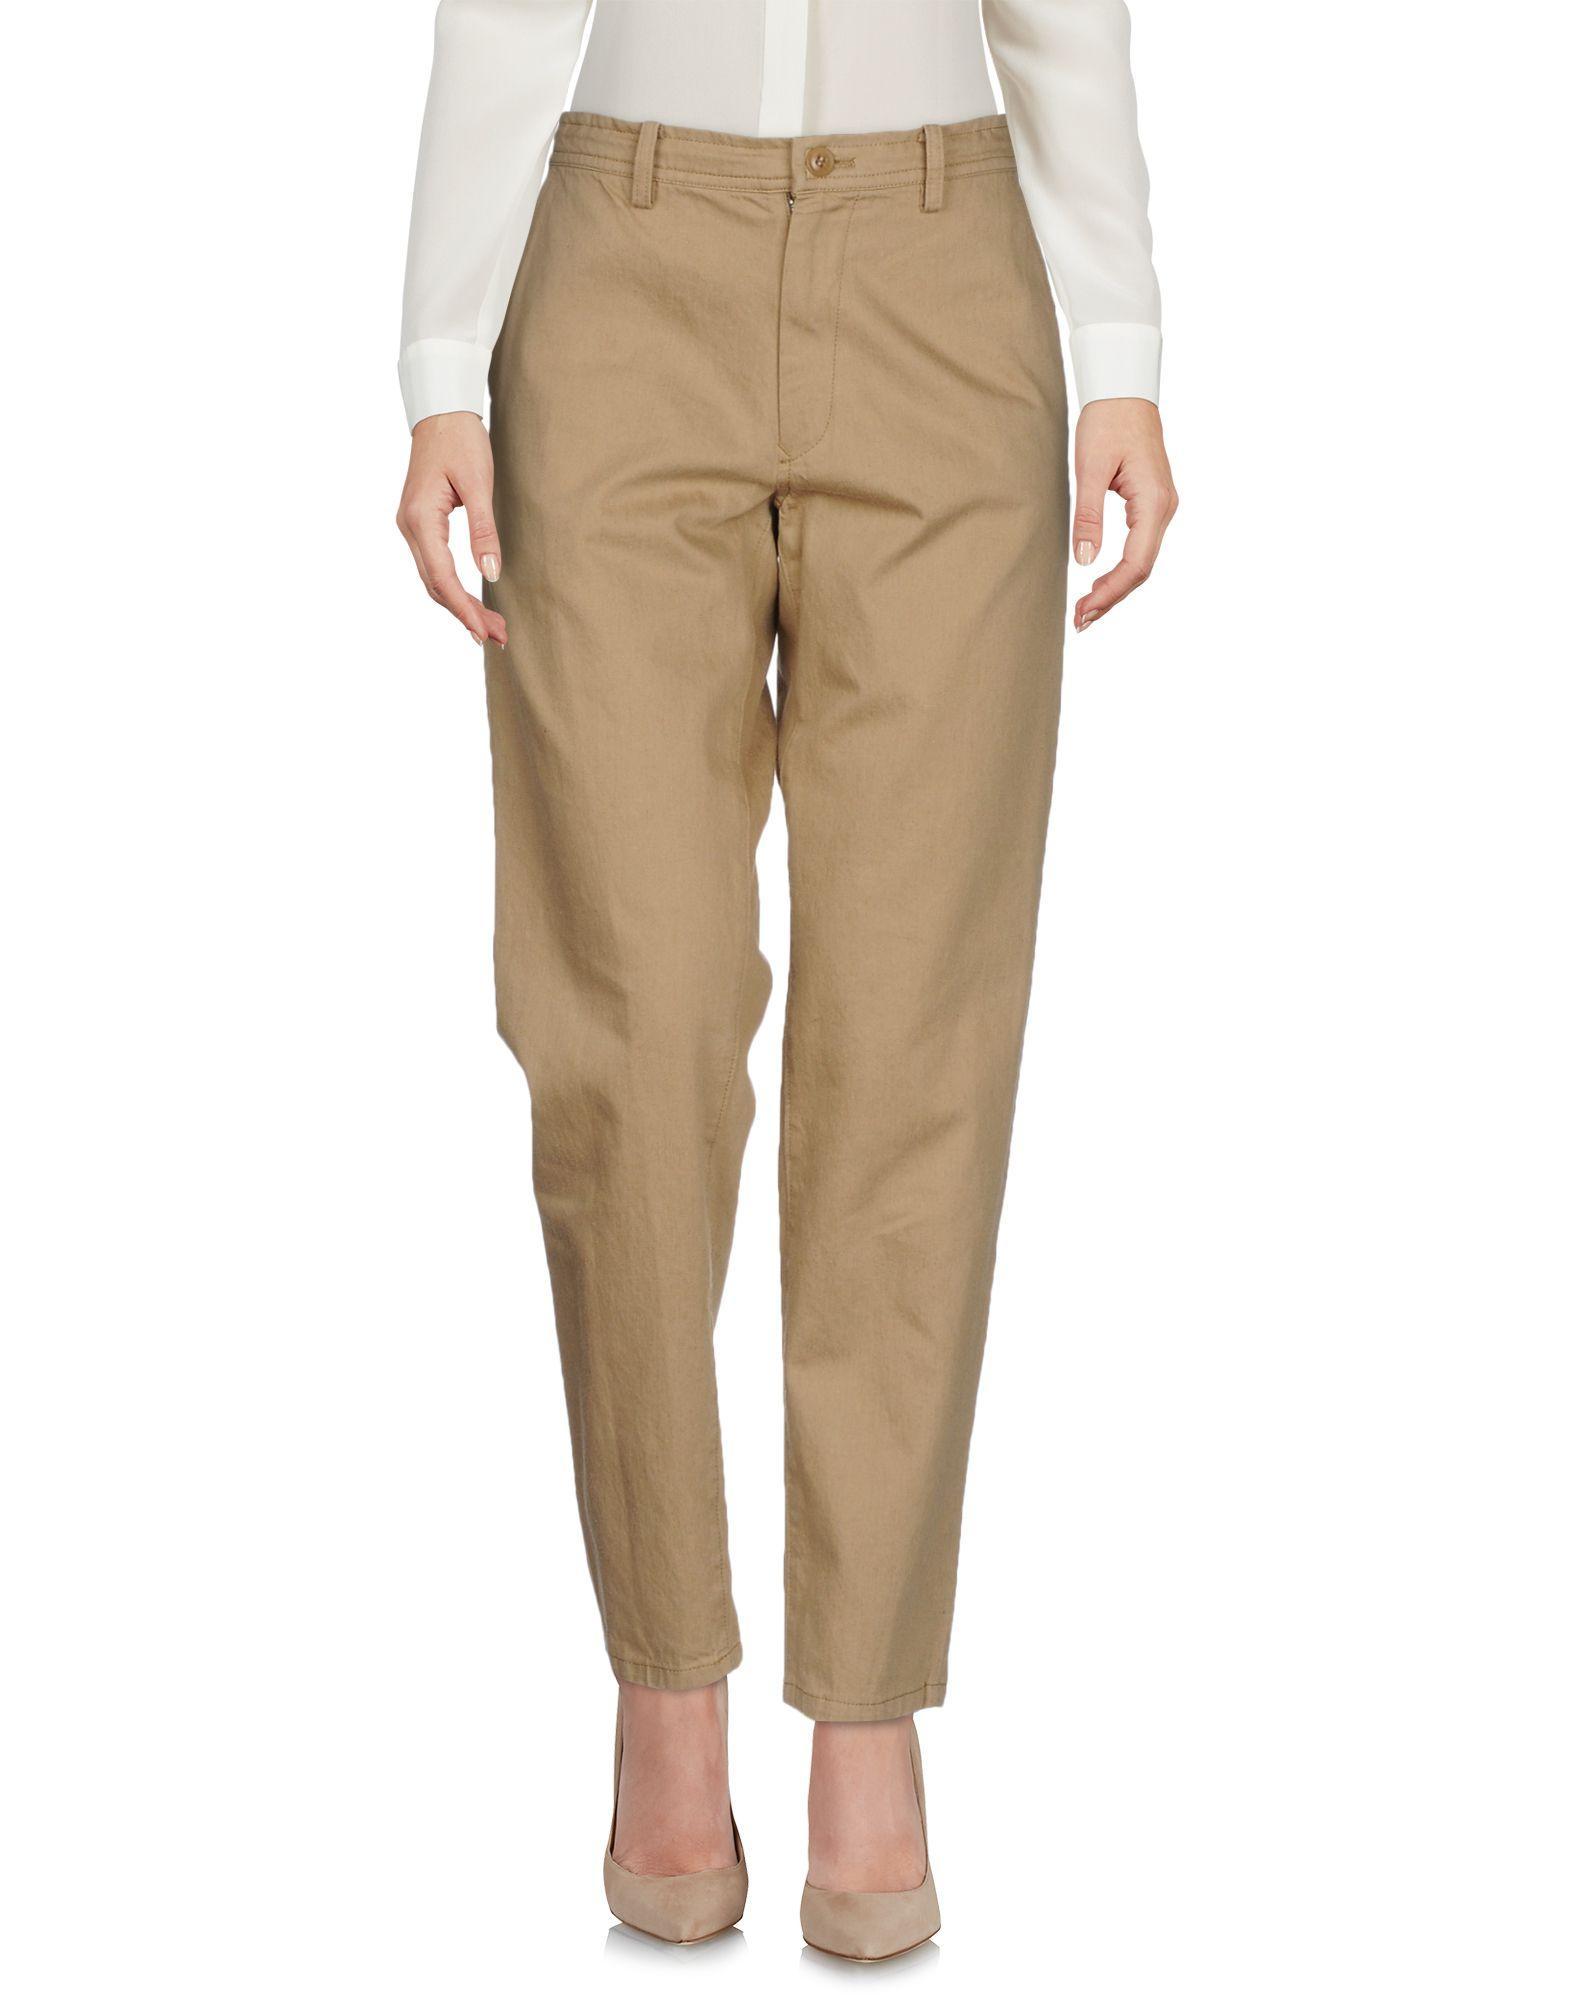 Y's Casual Pants In Camel